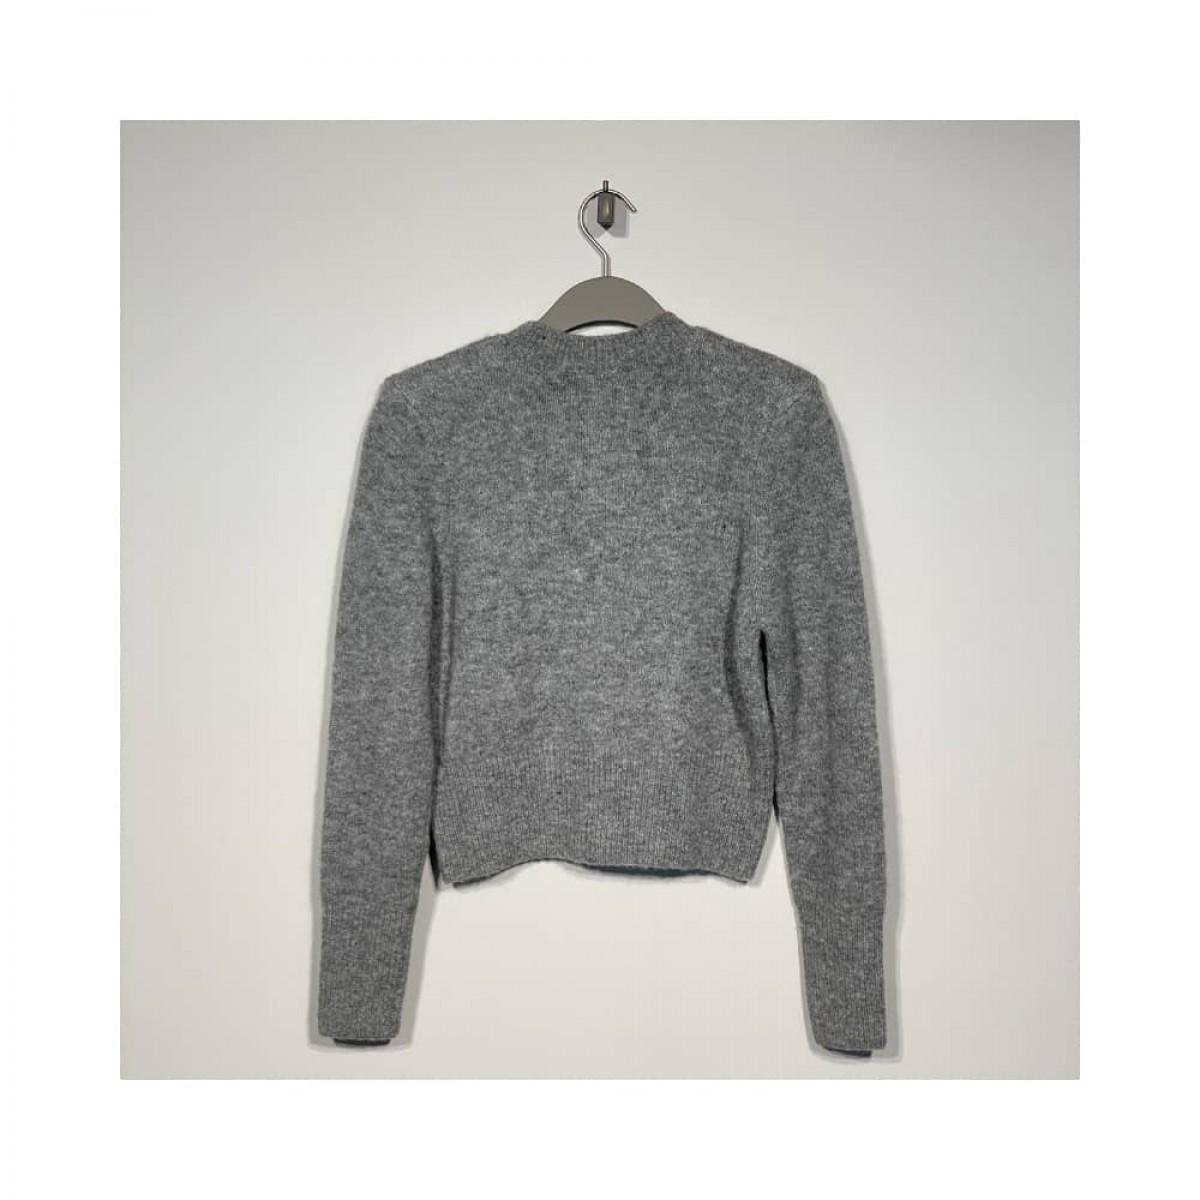 hudson cardigan - grey - bag